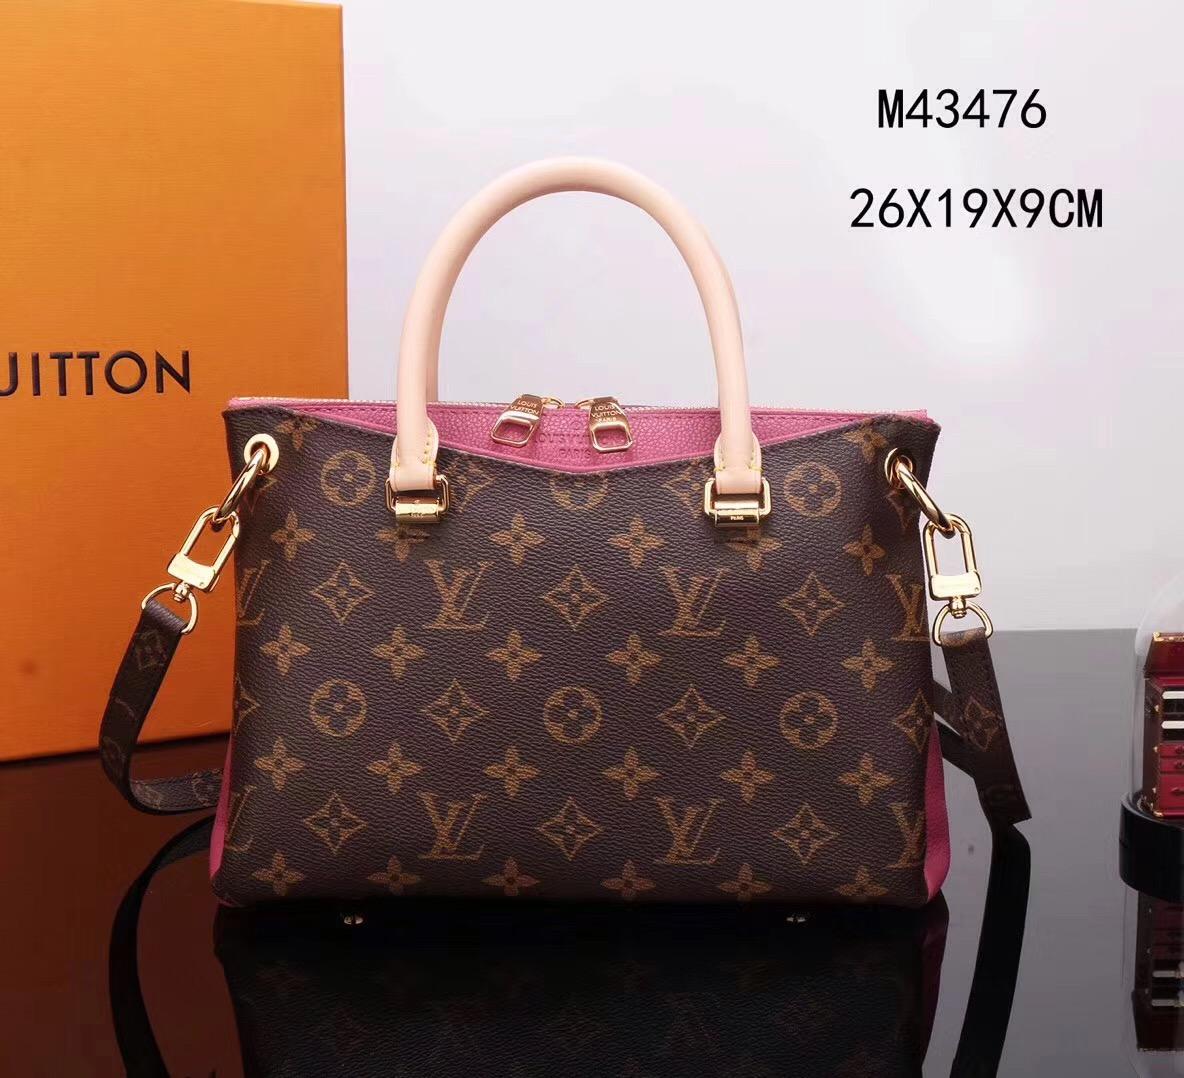 929dc343a7b9 The Best Louis Vuitton Original Quality Replica Handbags Online Store